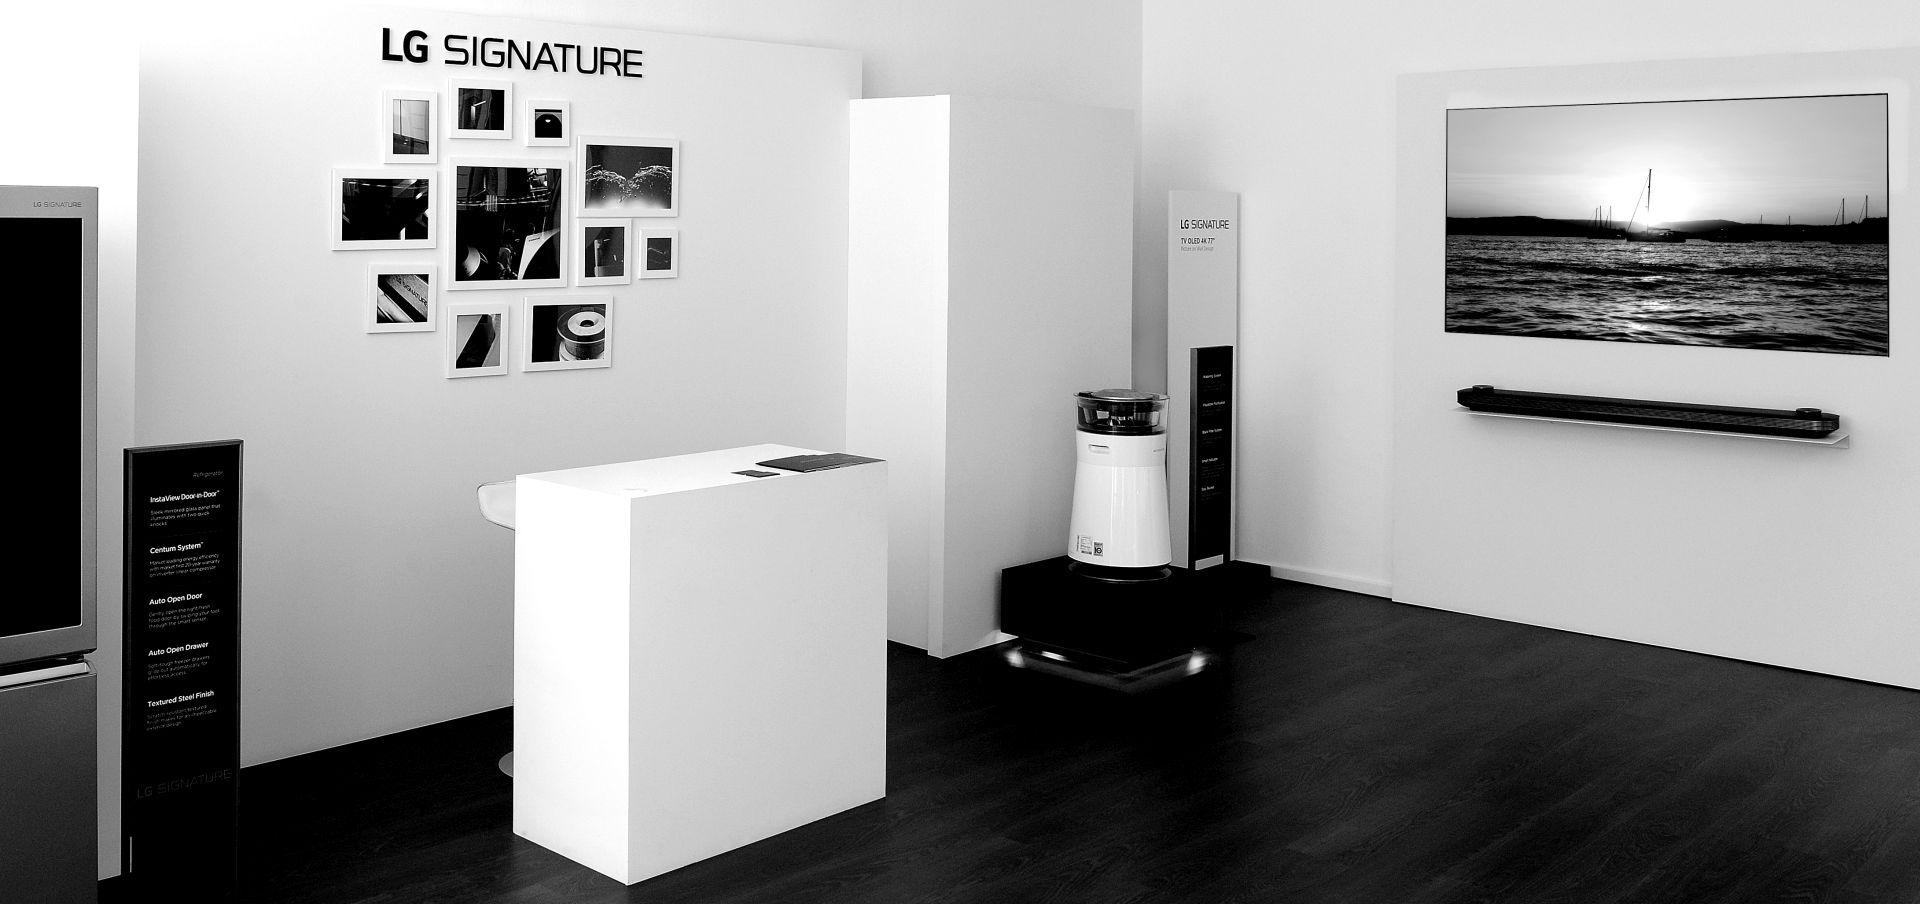 lg-signature-flagship-store-milano-01